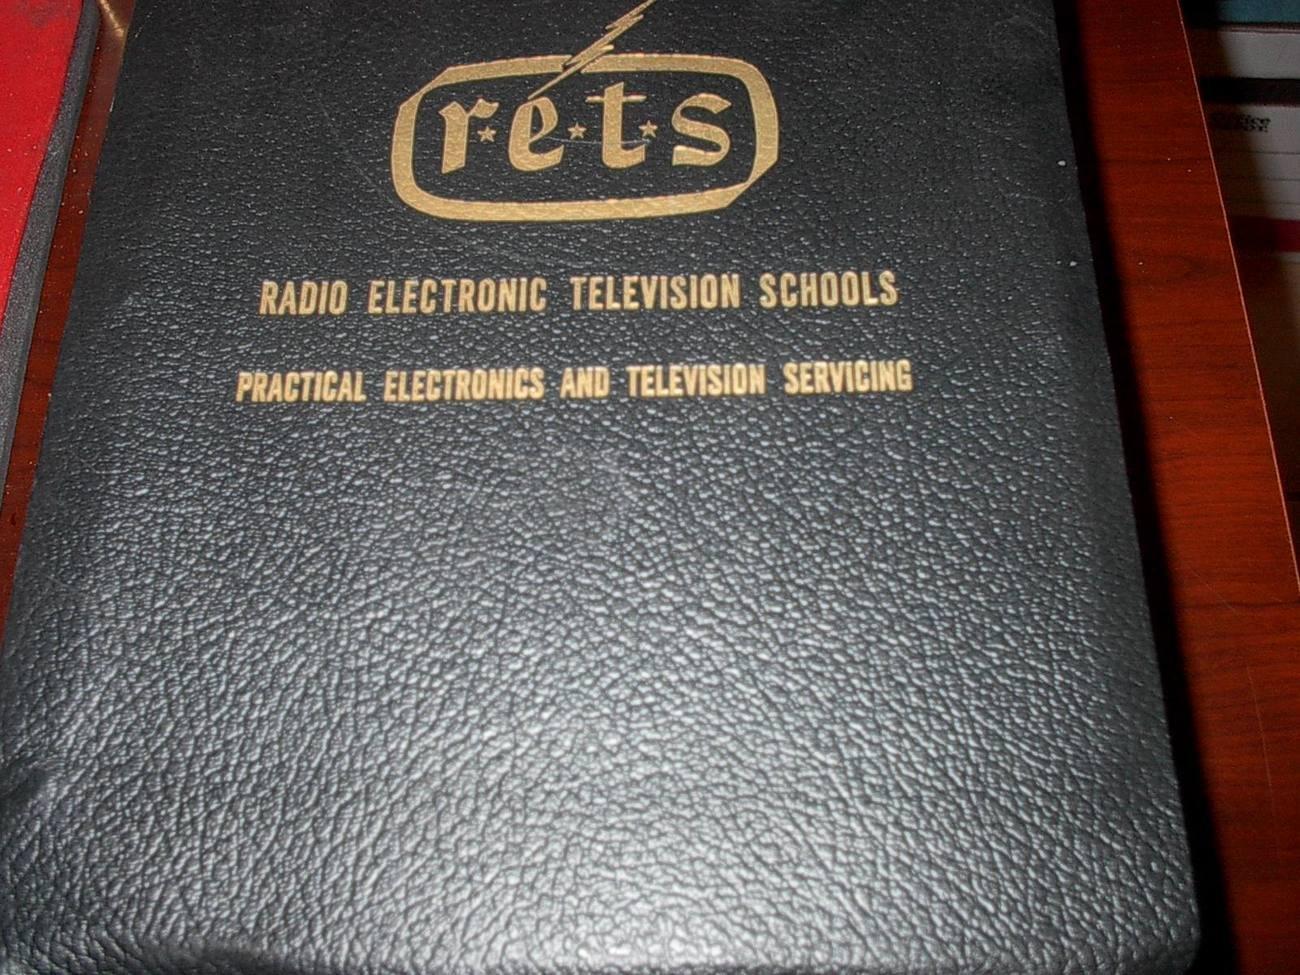 Radio Electronic Television Schools, Inc. (RETS) Practical